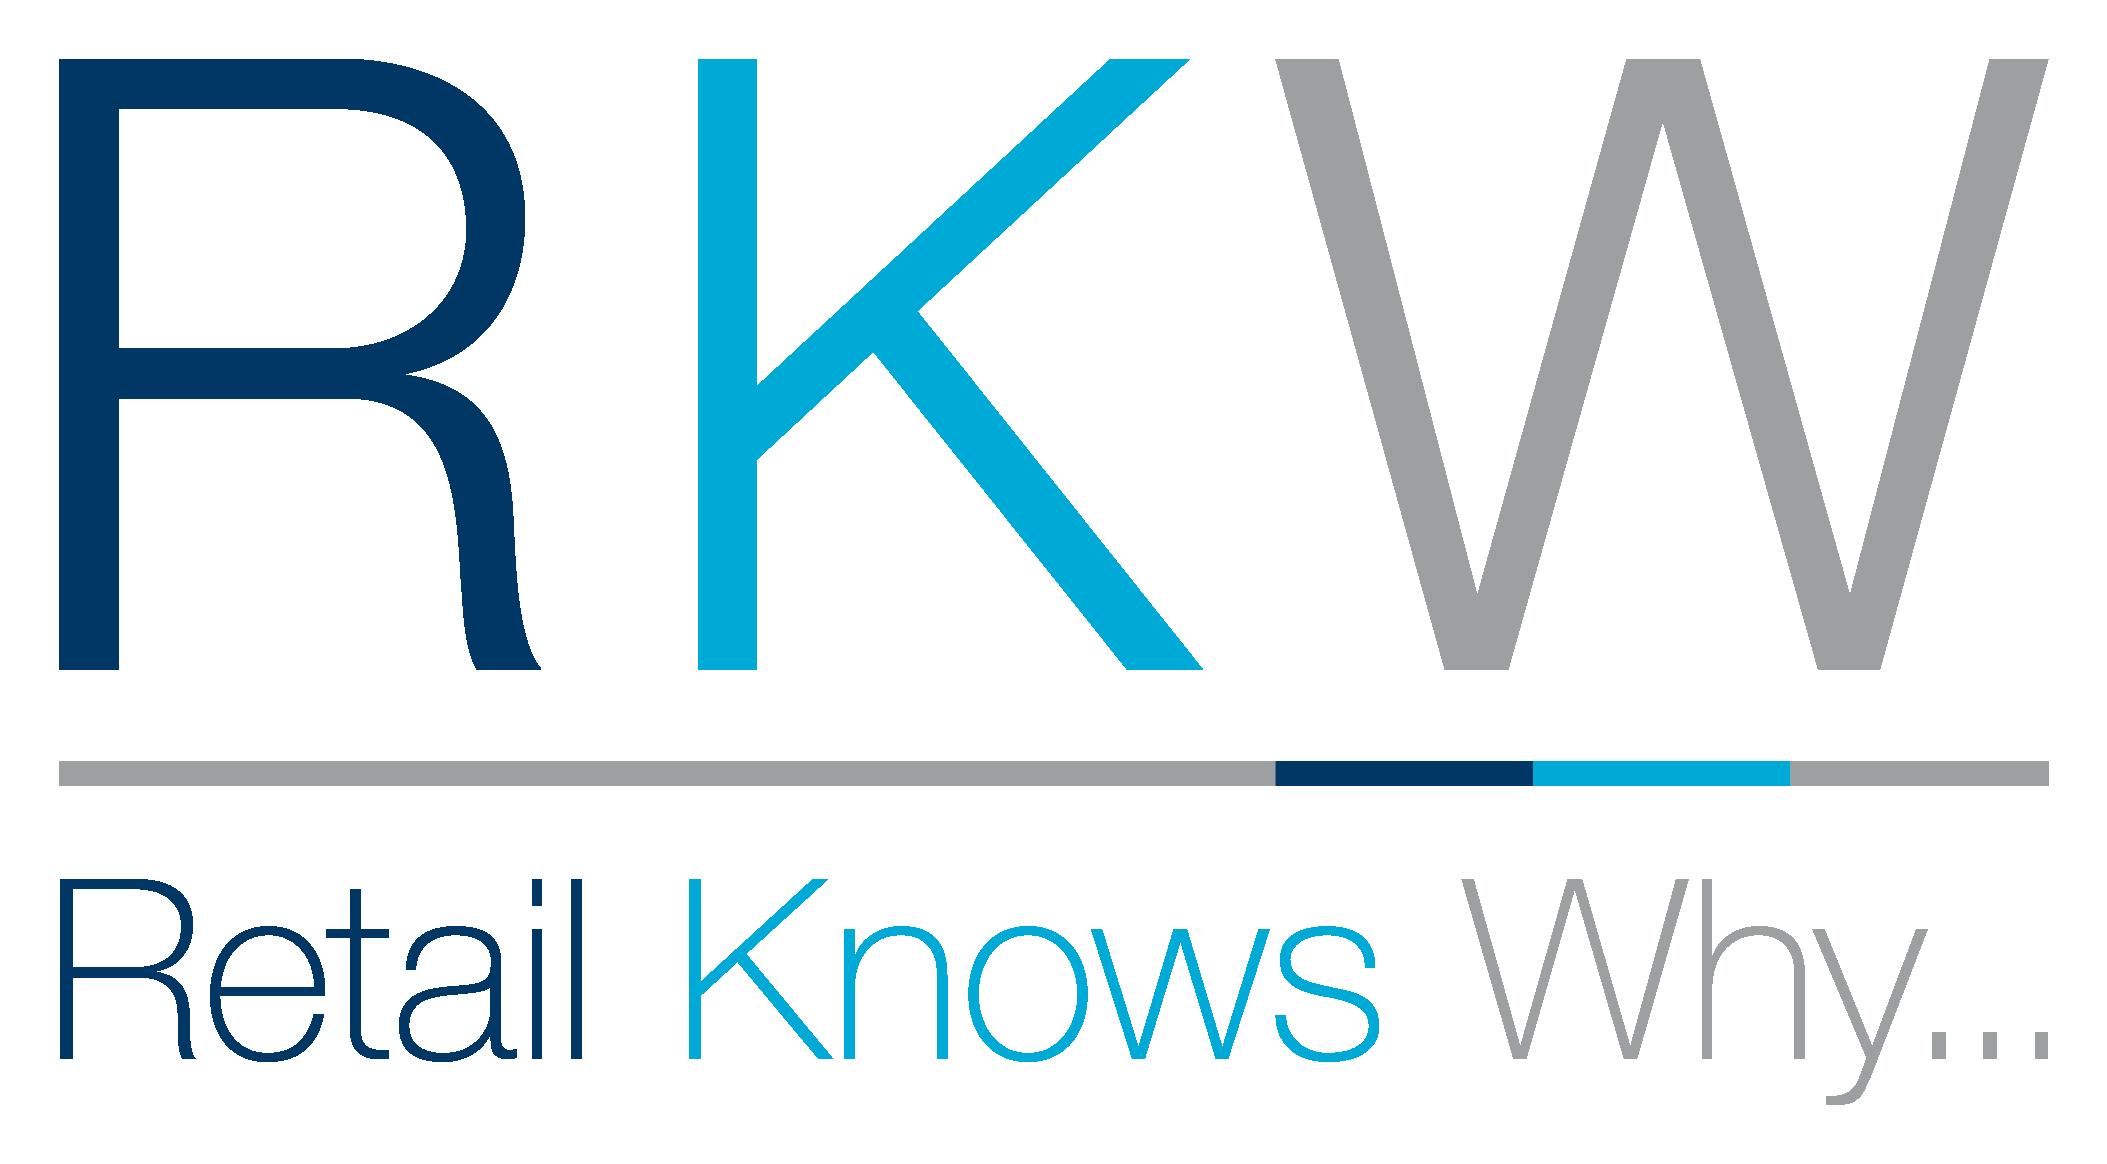 RKW Ltd